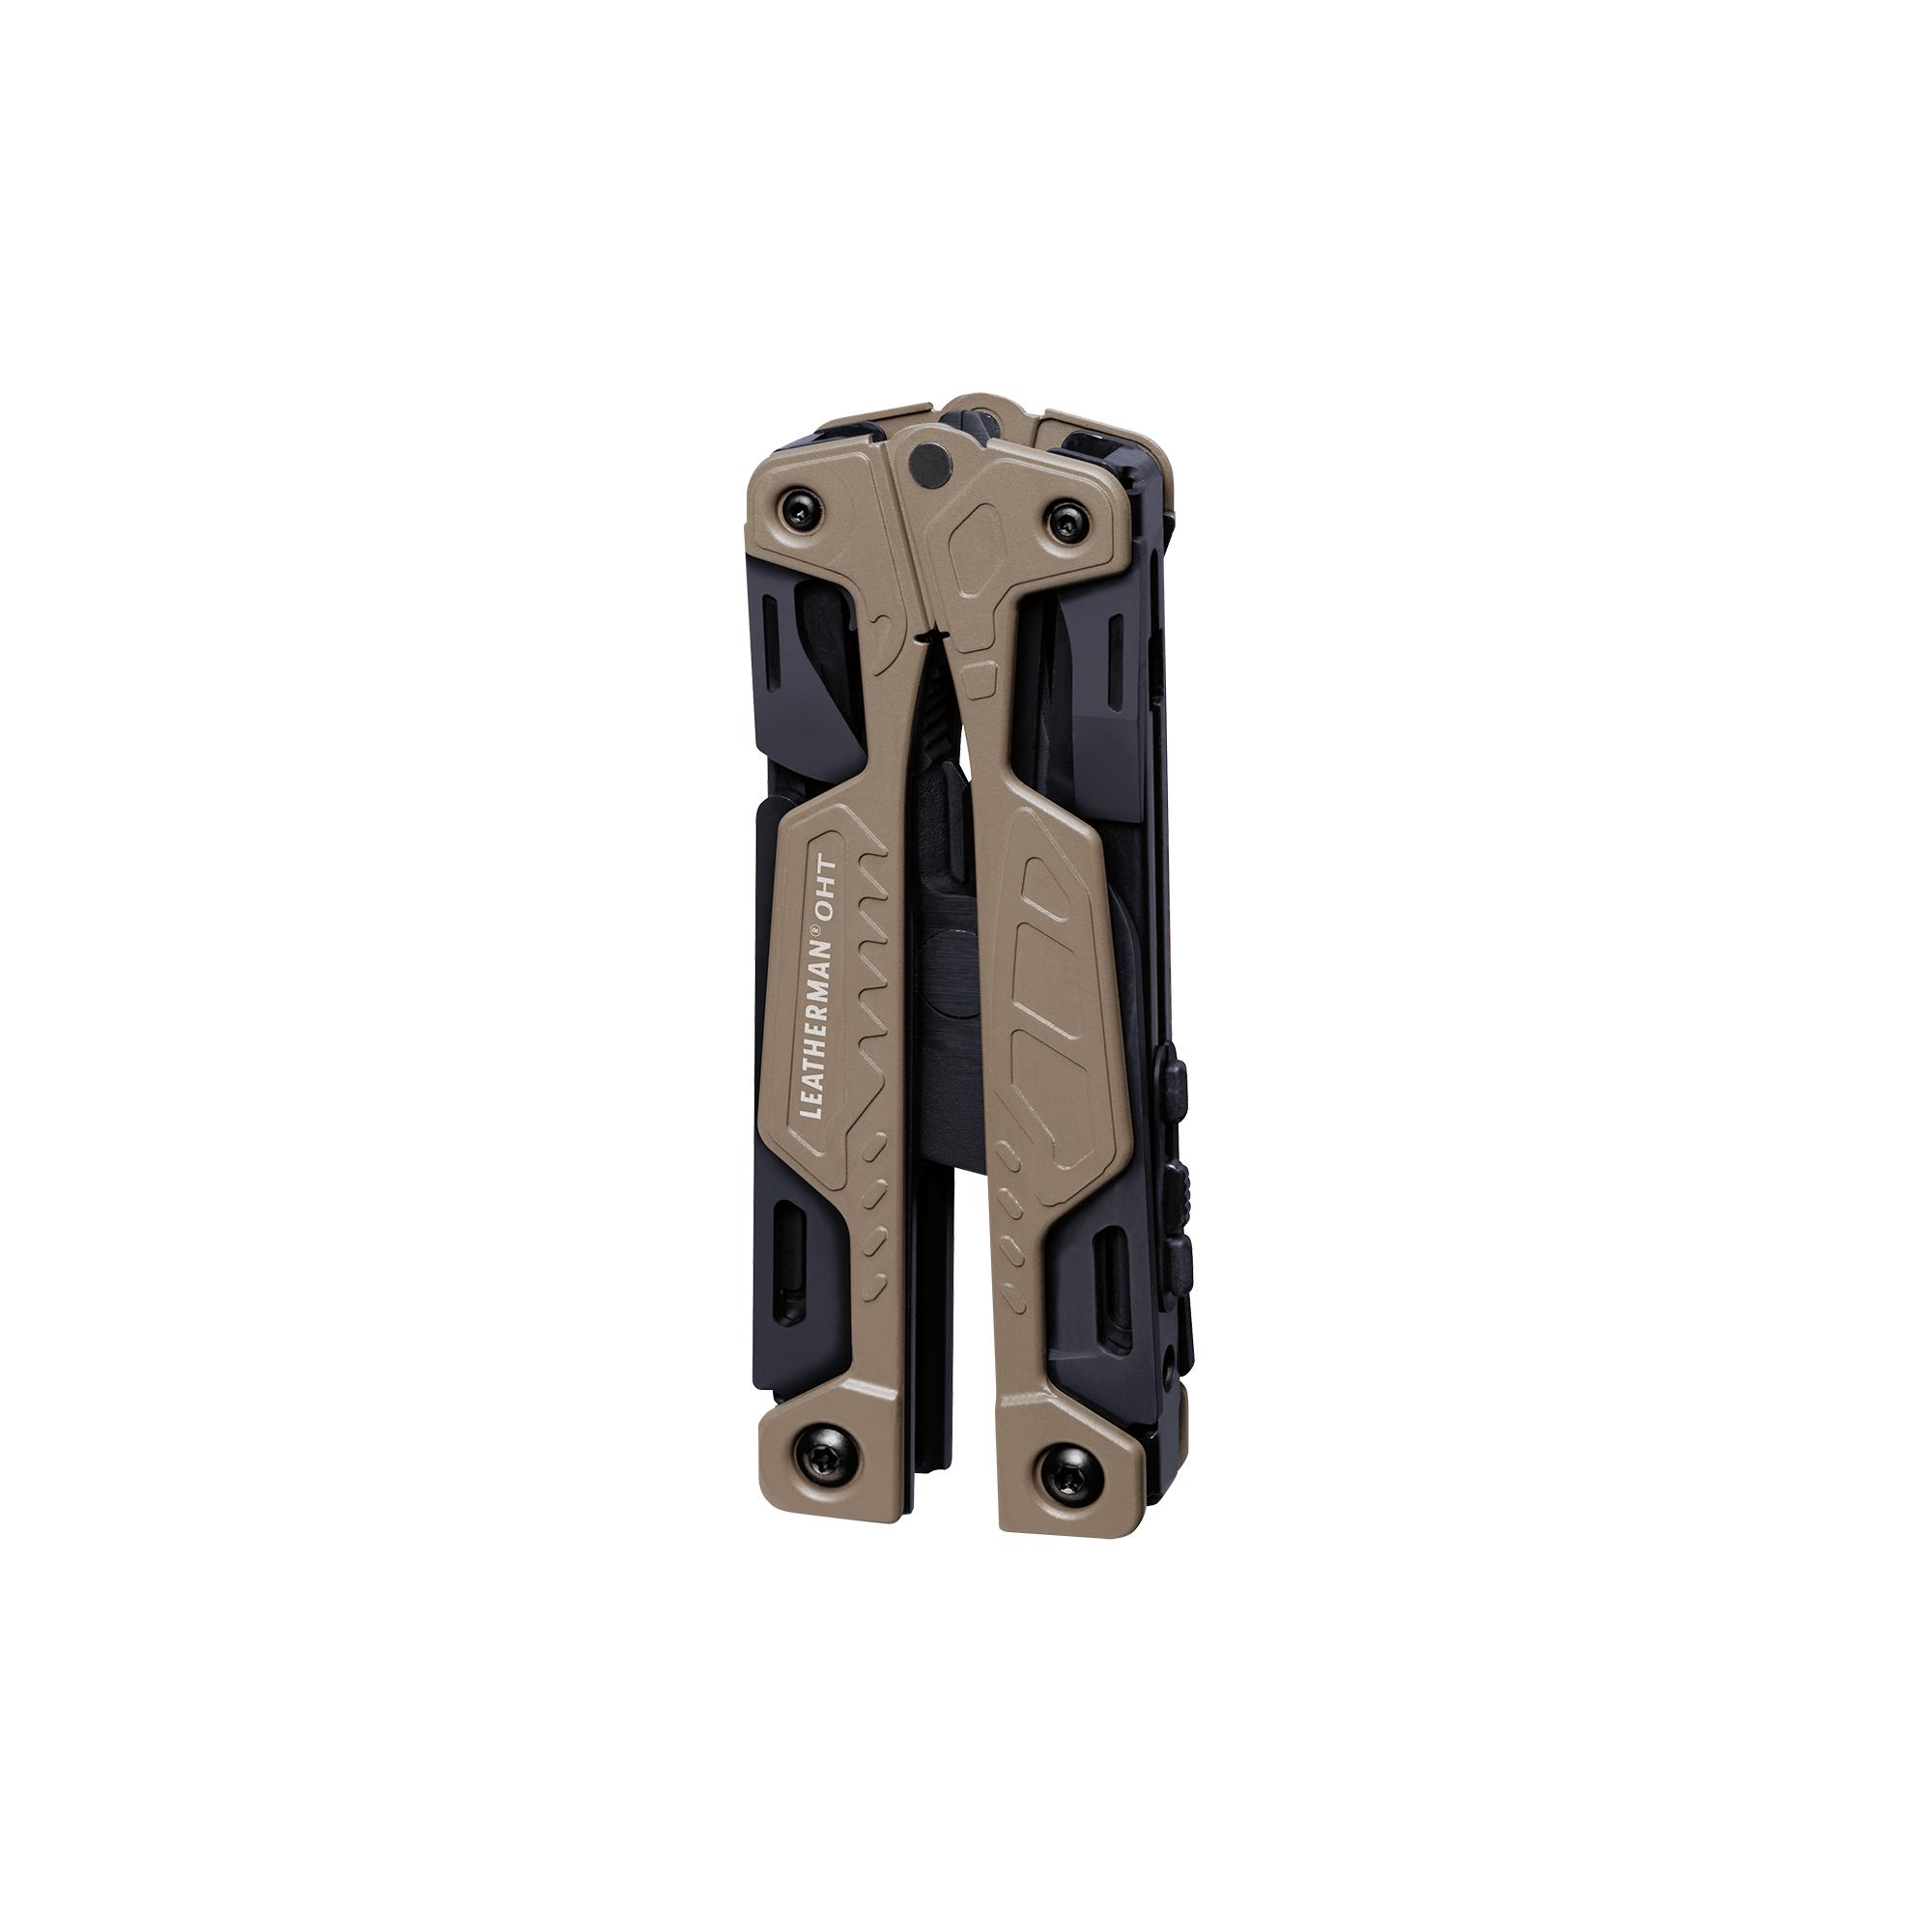 Leatherman OHT multi-tool, coyote tan, 16 tools, closed view